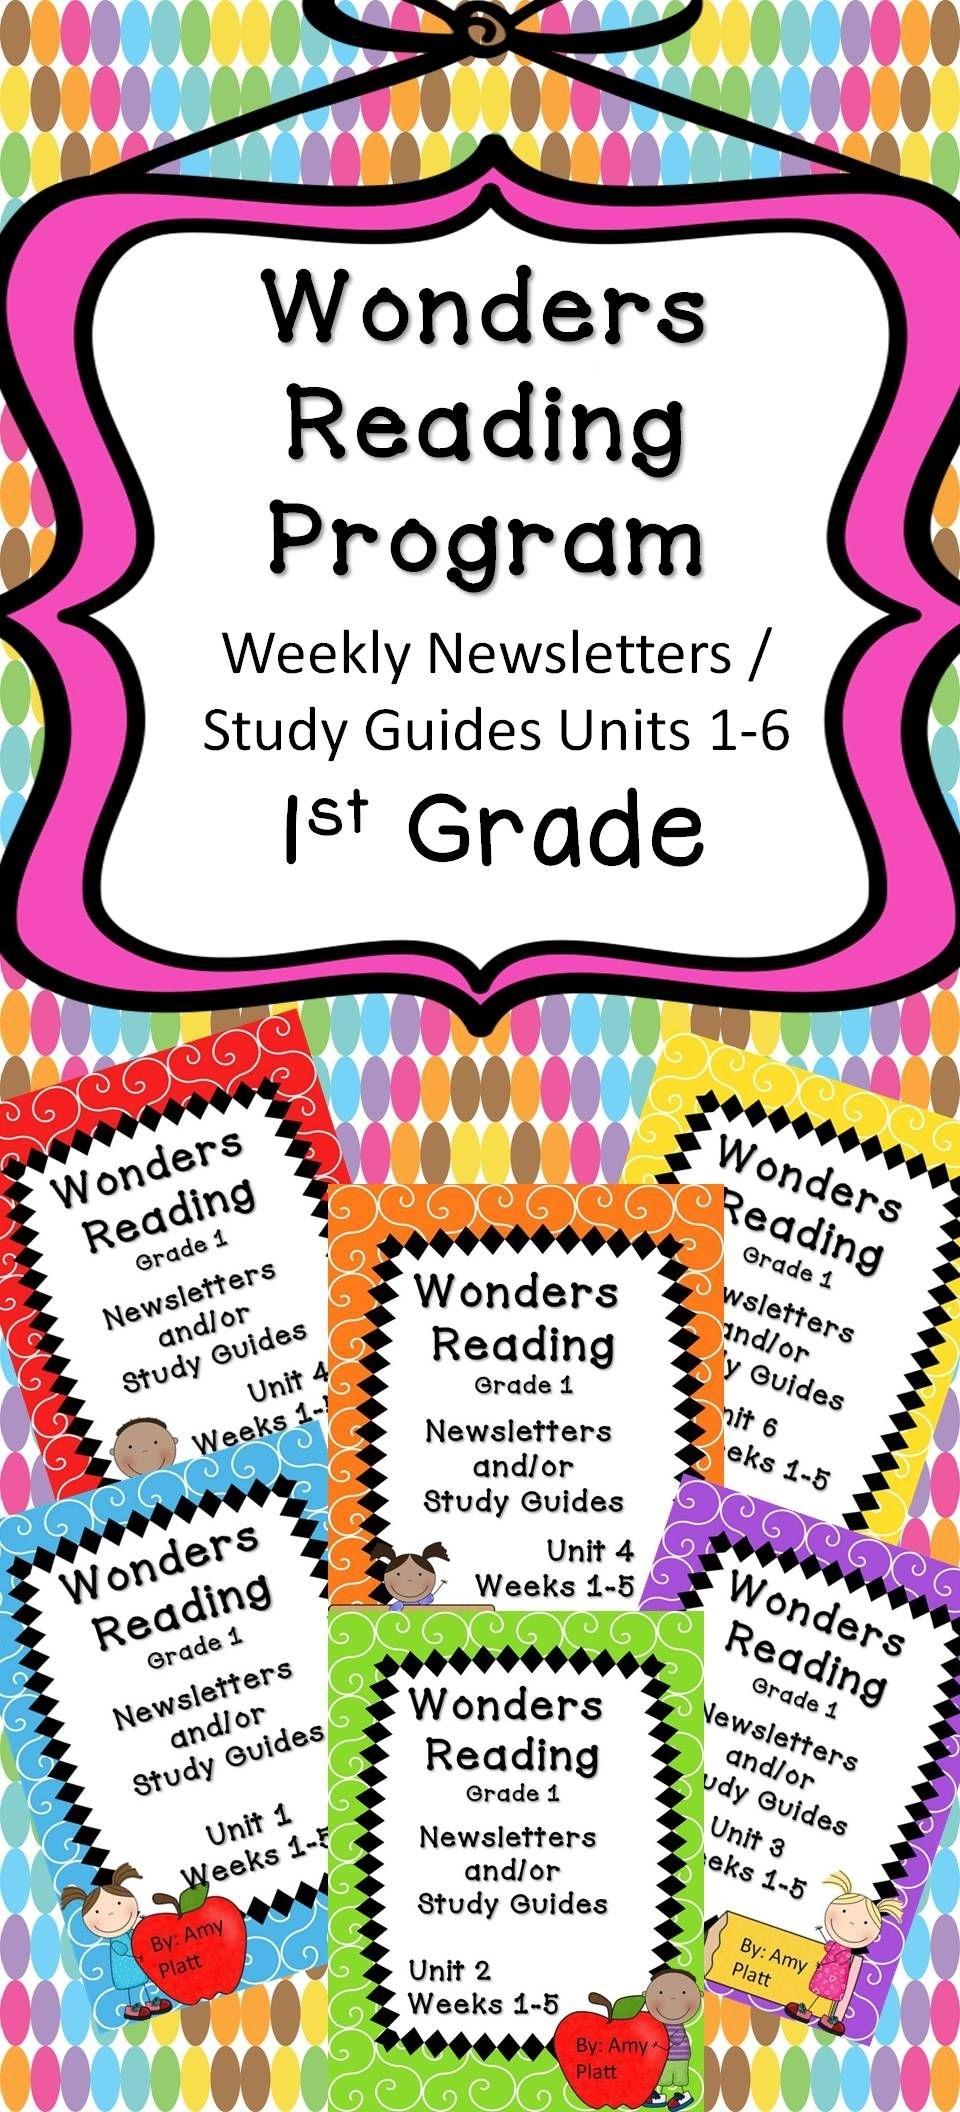 Wonders Reading Grade 1 Units 1-6 Newsletter / Study Guides | Tpt within 1St Grade Newsletters In 1St Grade